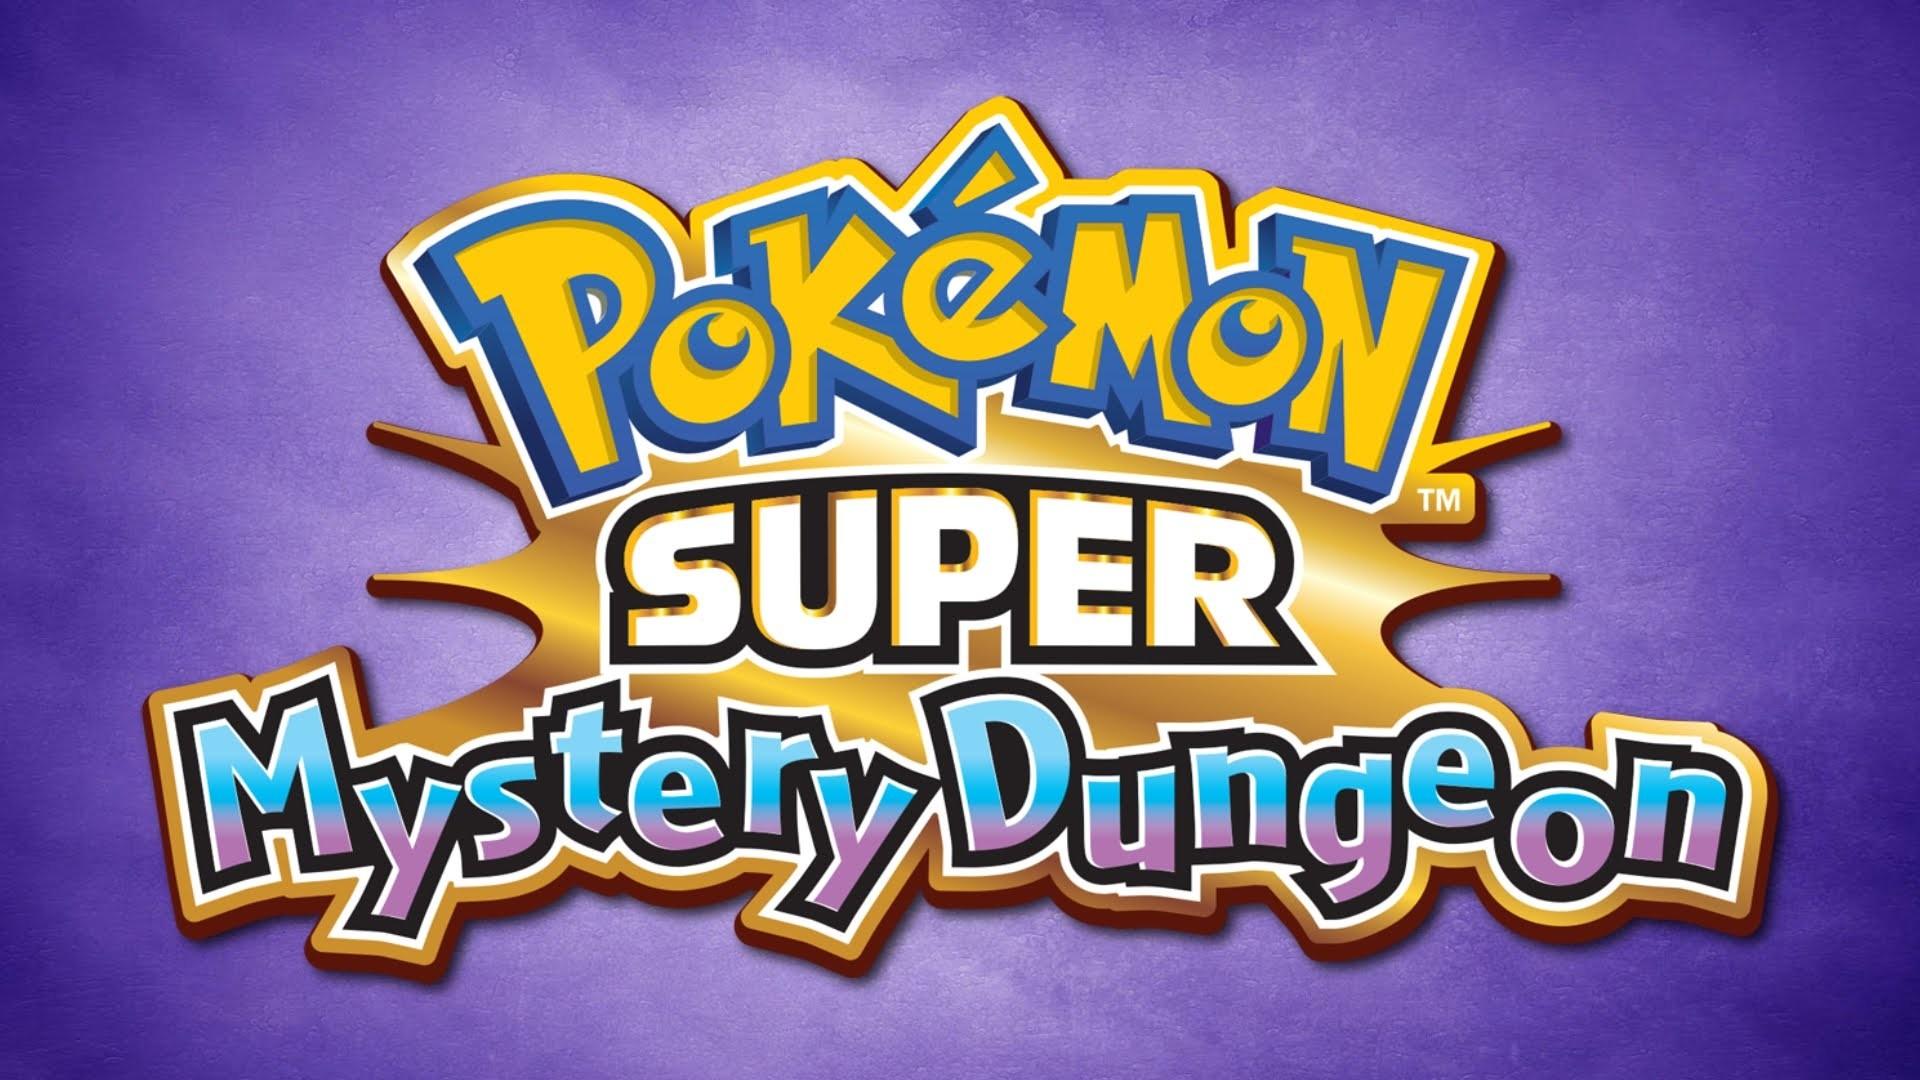 Pokemon Super Mystery Dungeon E3 2015?